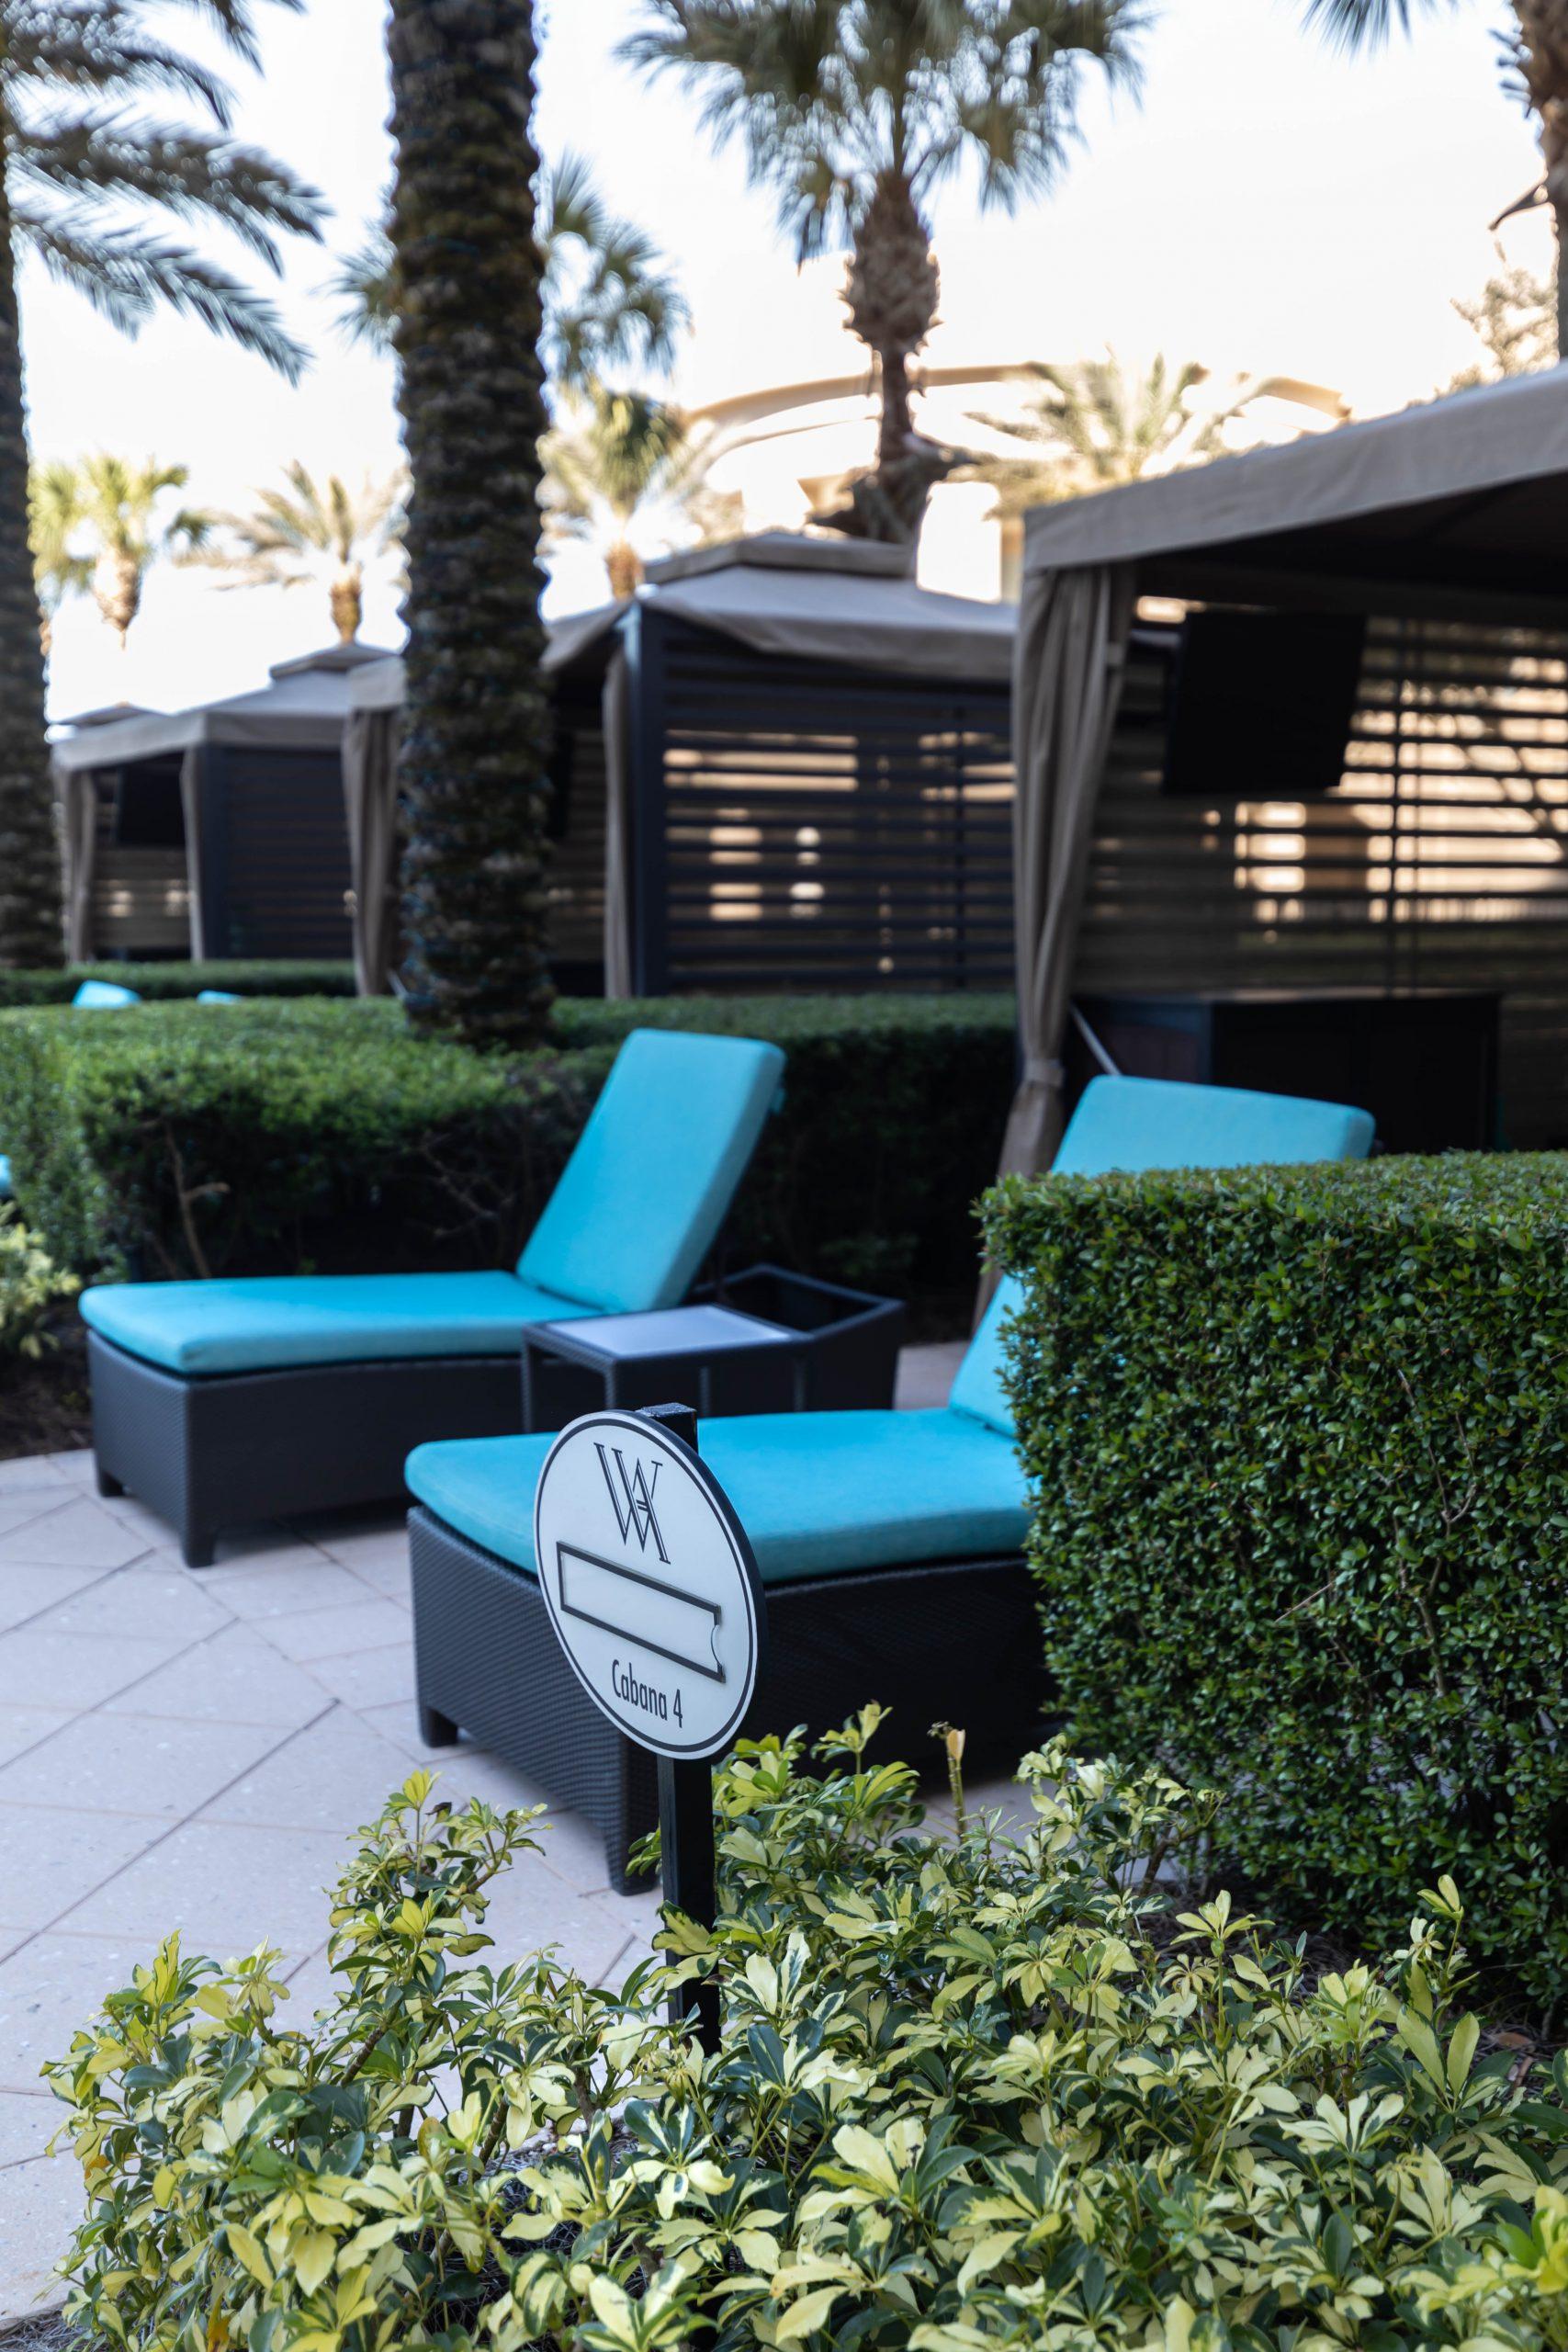 Waldorf Astoria Pool Deck in Orlando Florida by Annie Fairfax